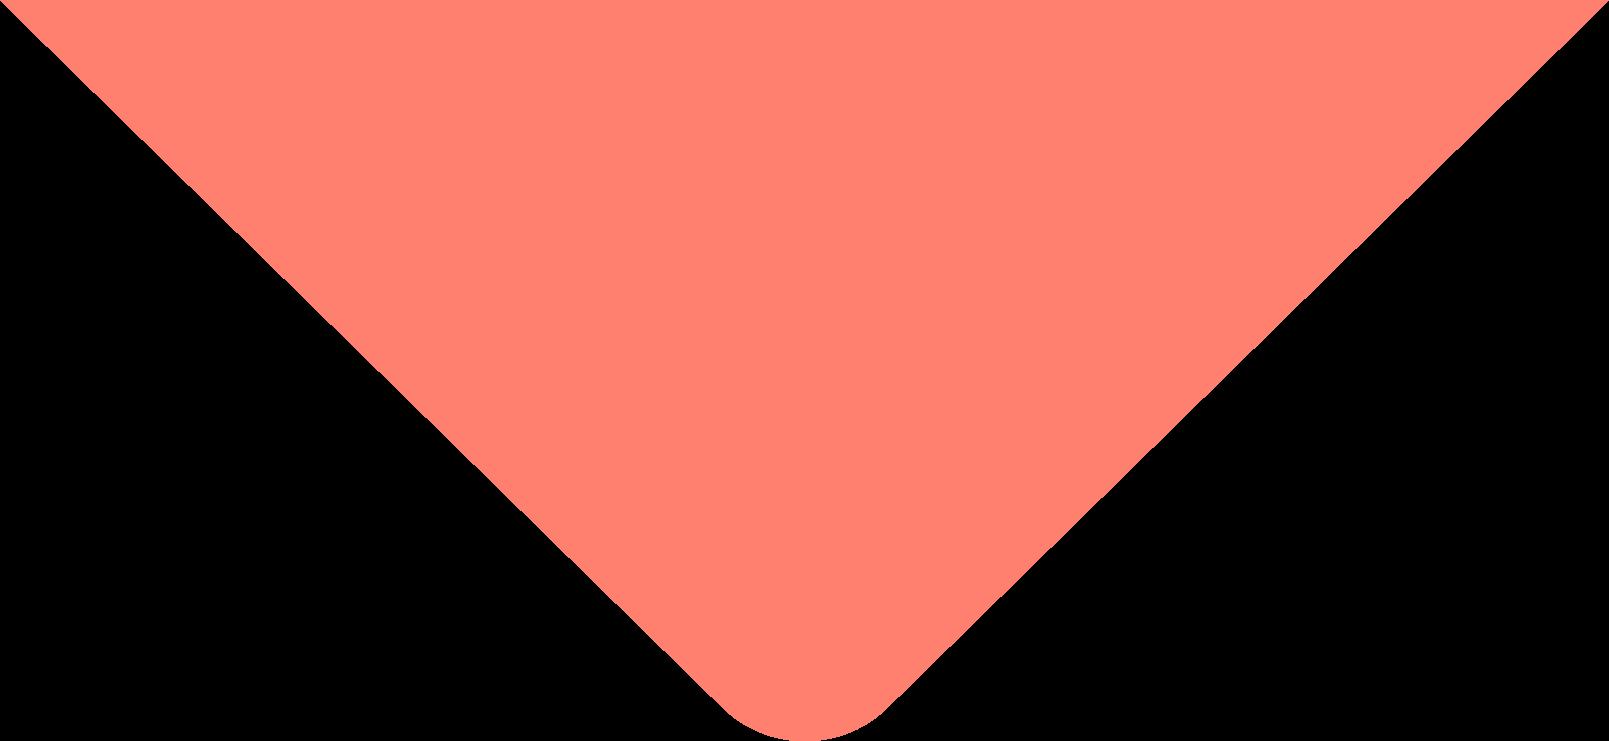 roze pijl